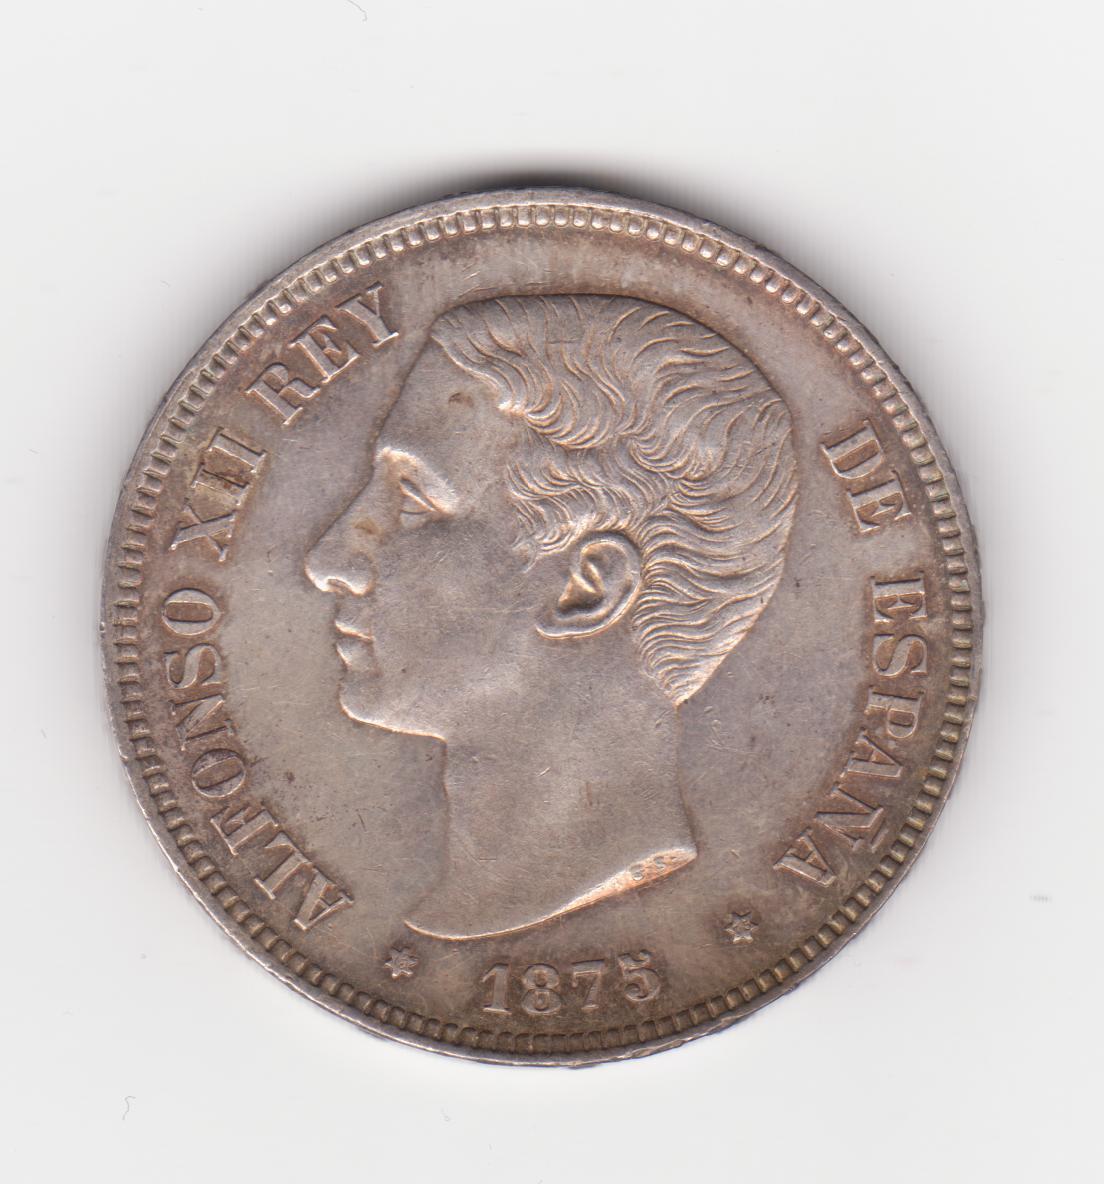 5 pesetas 1875, Alfonso XII 5_pesetas_1875_004